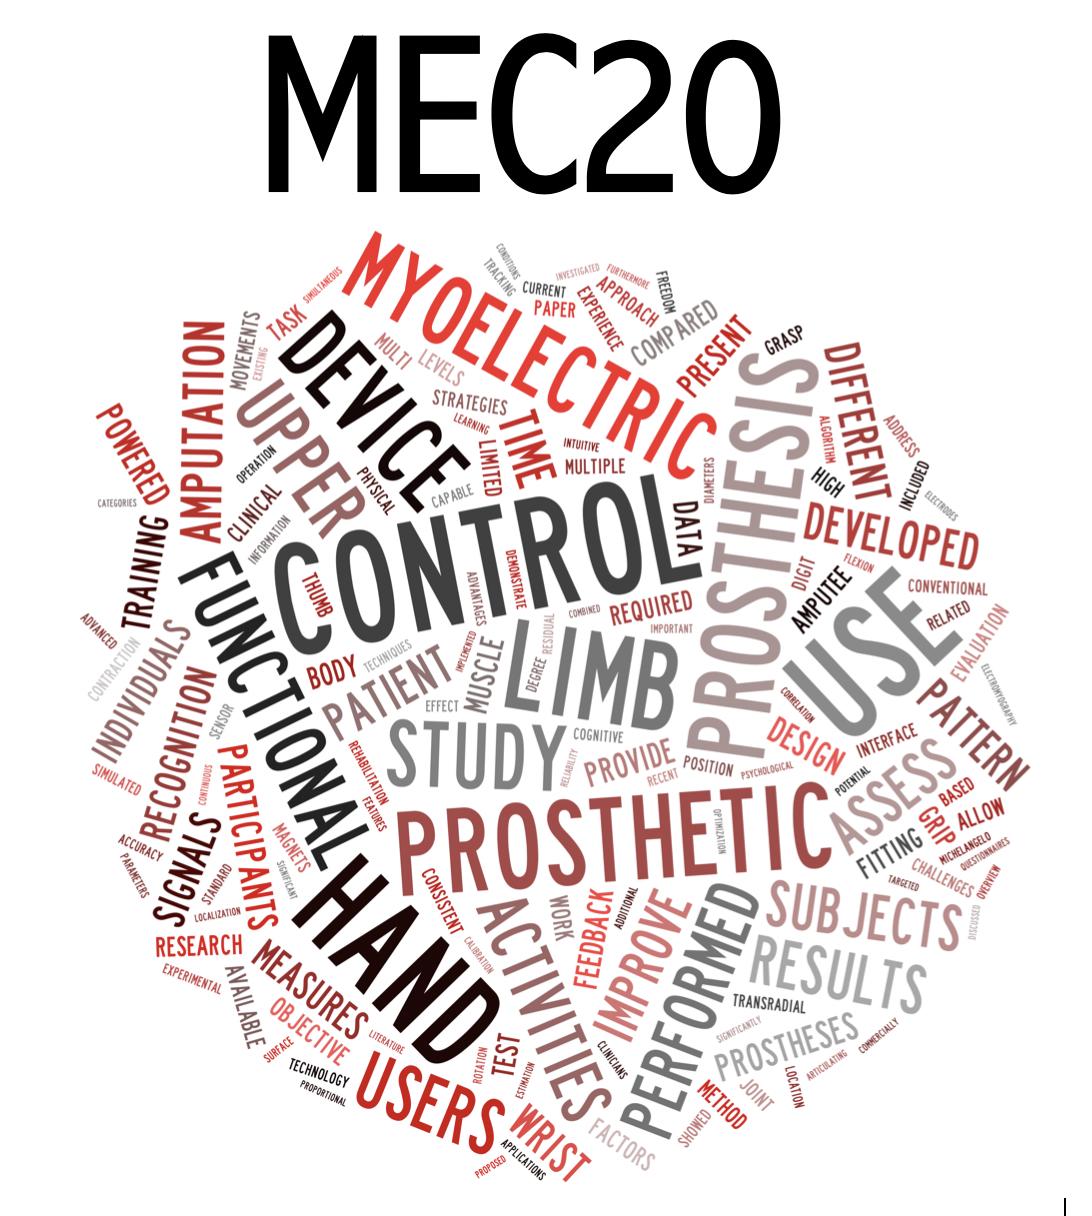 View 2020: MEC20